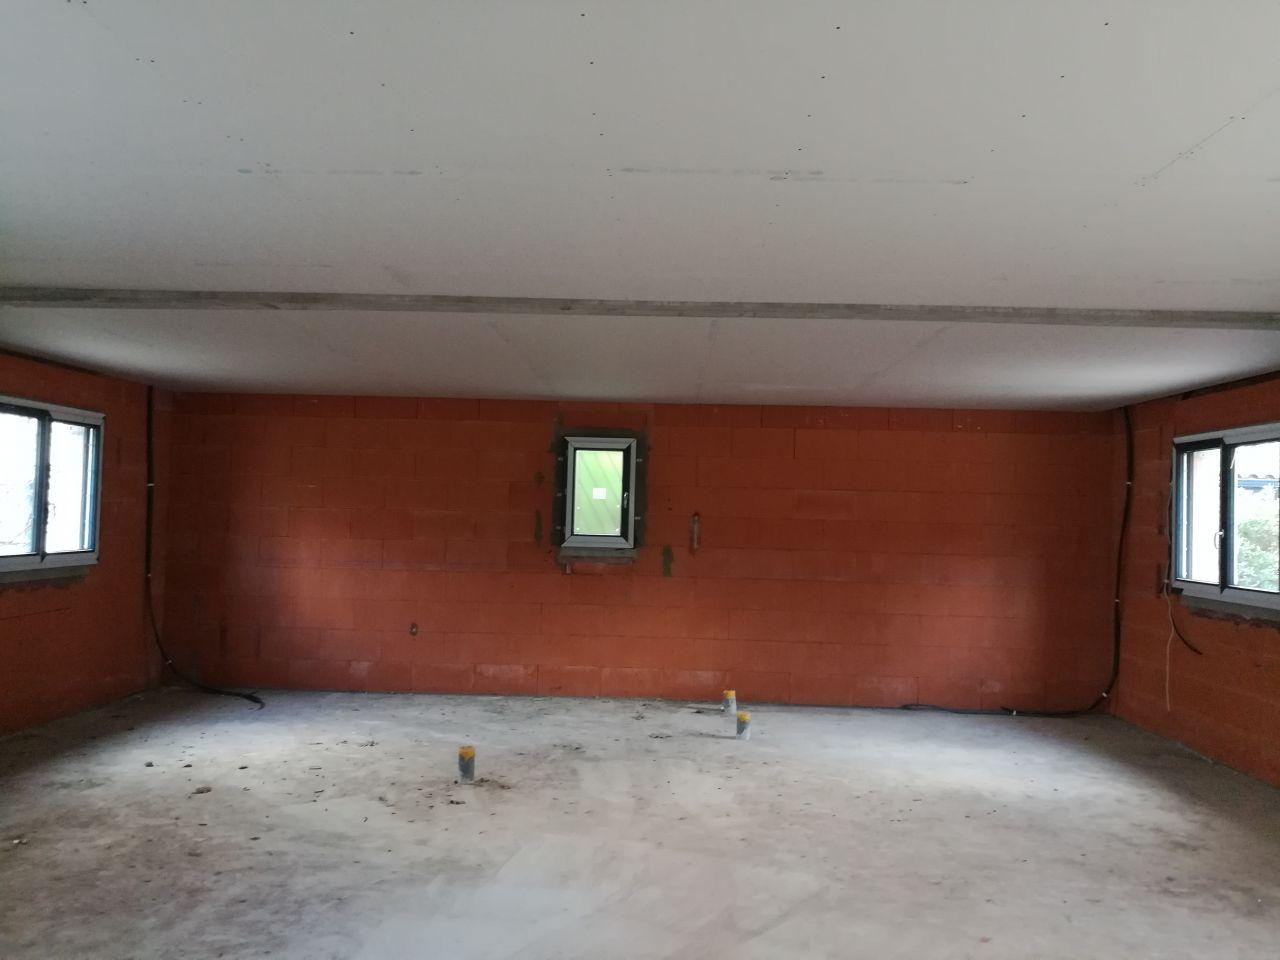 Pose du plaquo au plafond